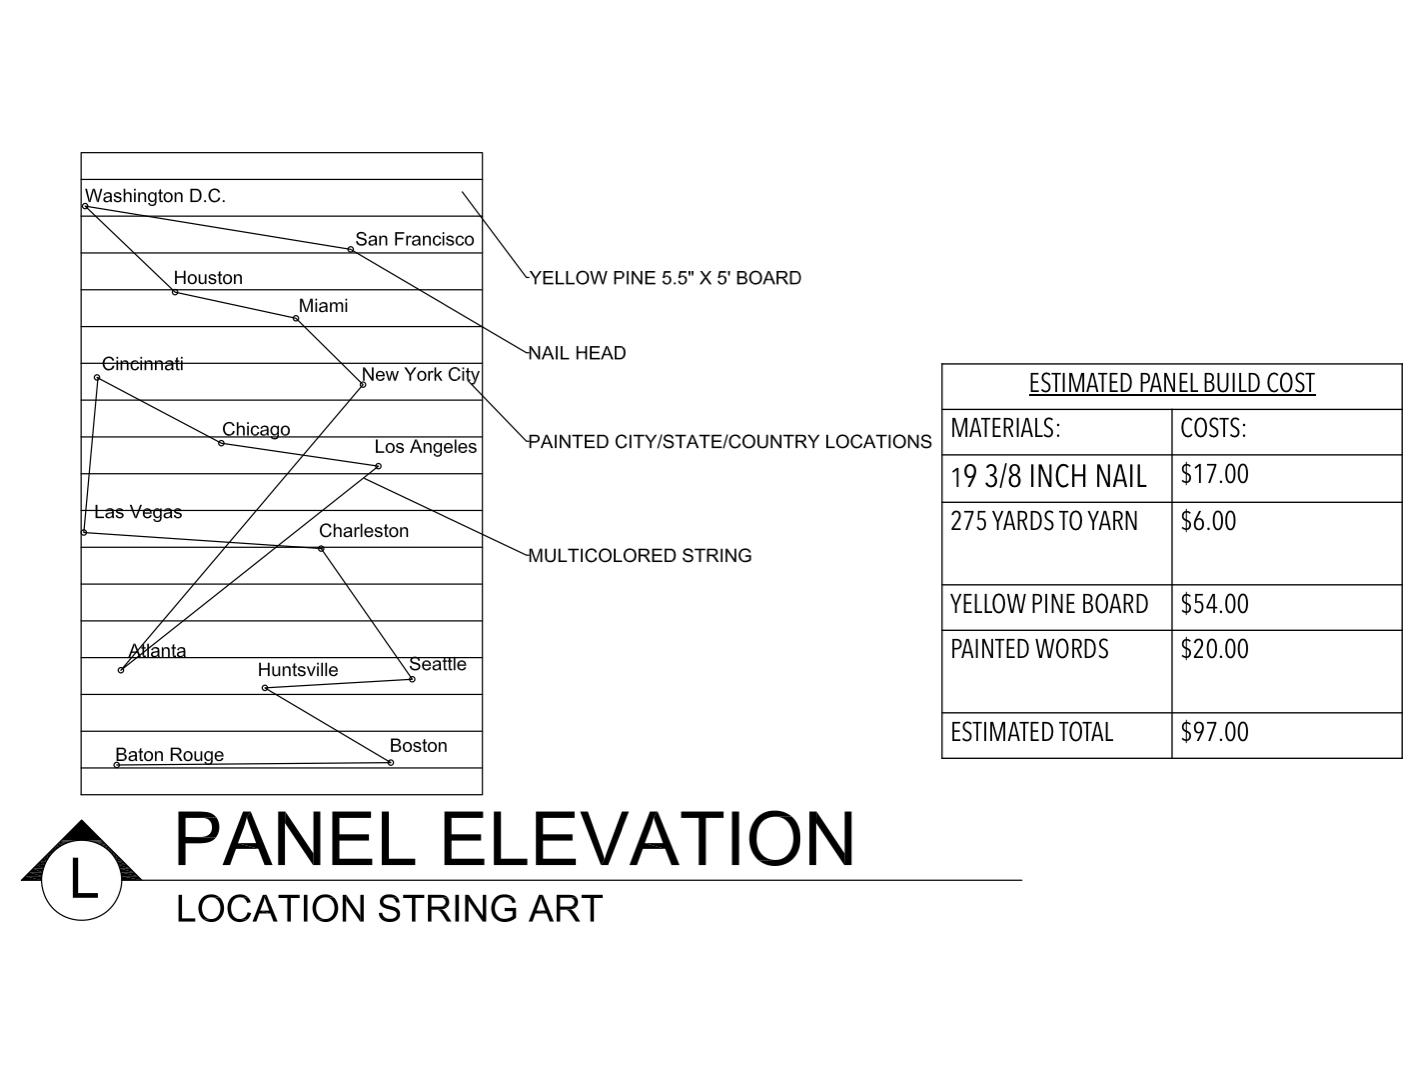 Panel Elevation L